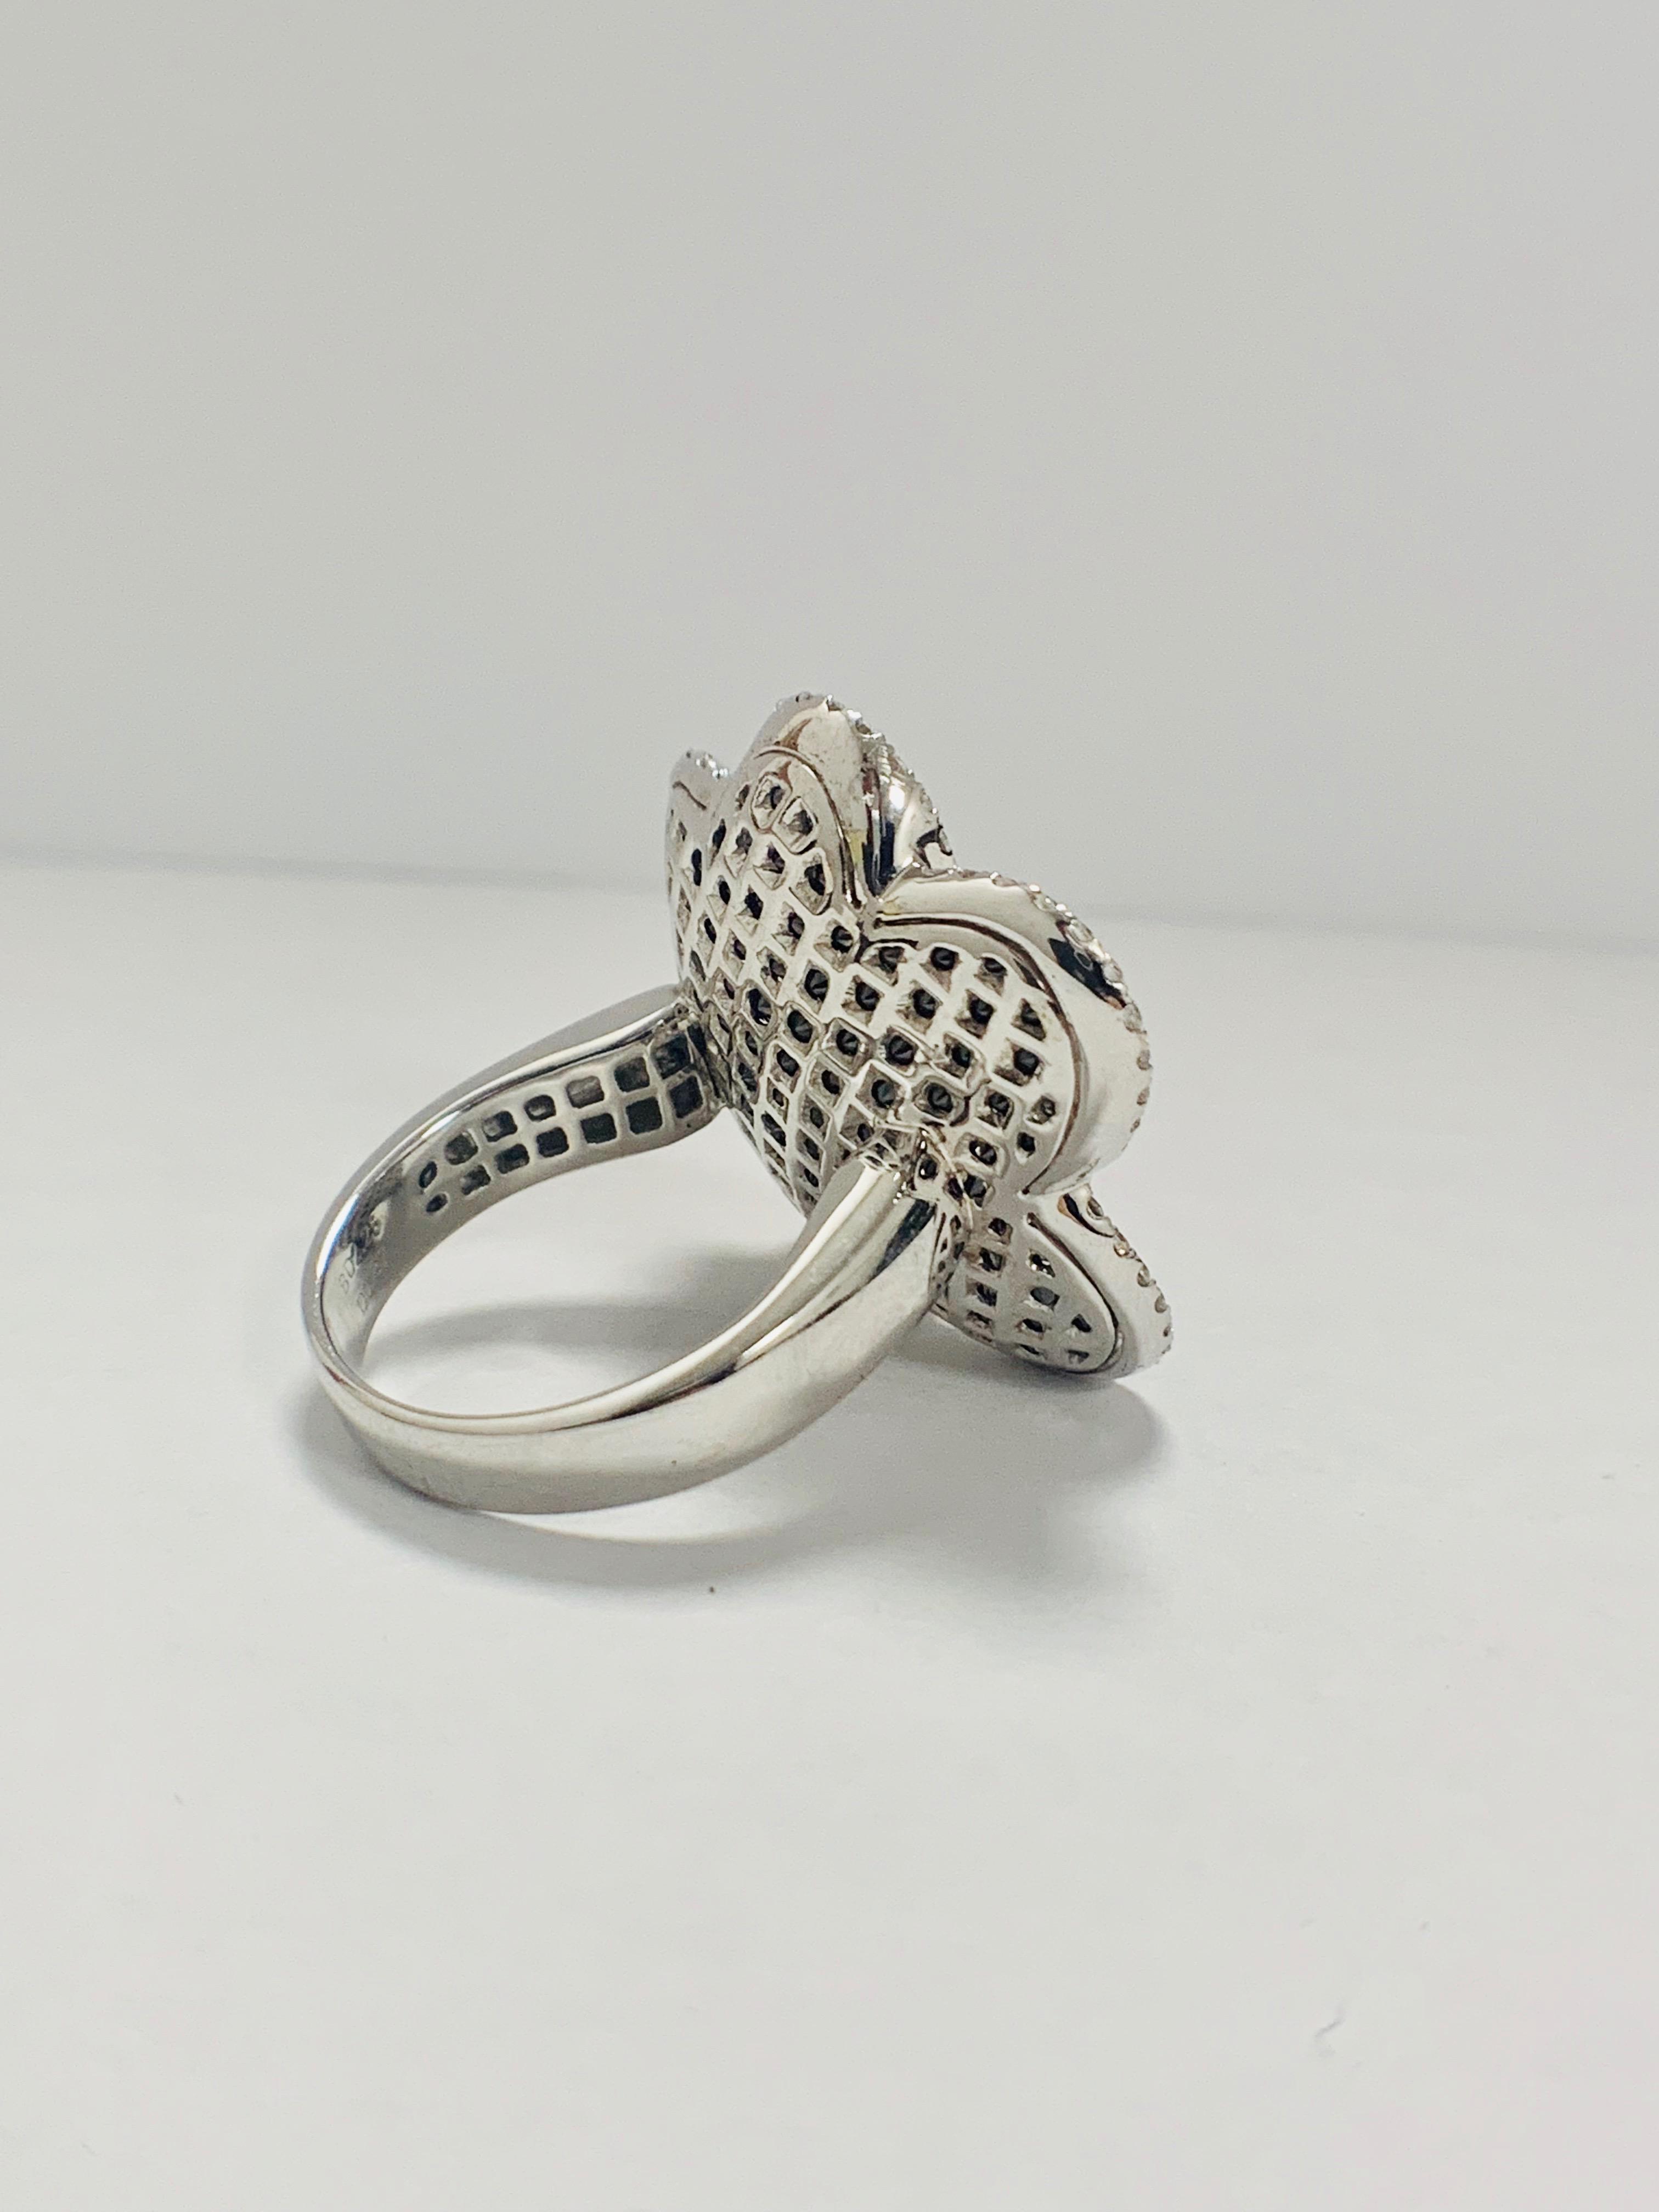 18ct White Gold Diamond flower design ring featuring 123 round cut, black Diamonds (2.25ct TBDW) - Image 6 of 13